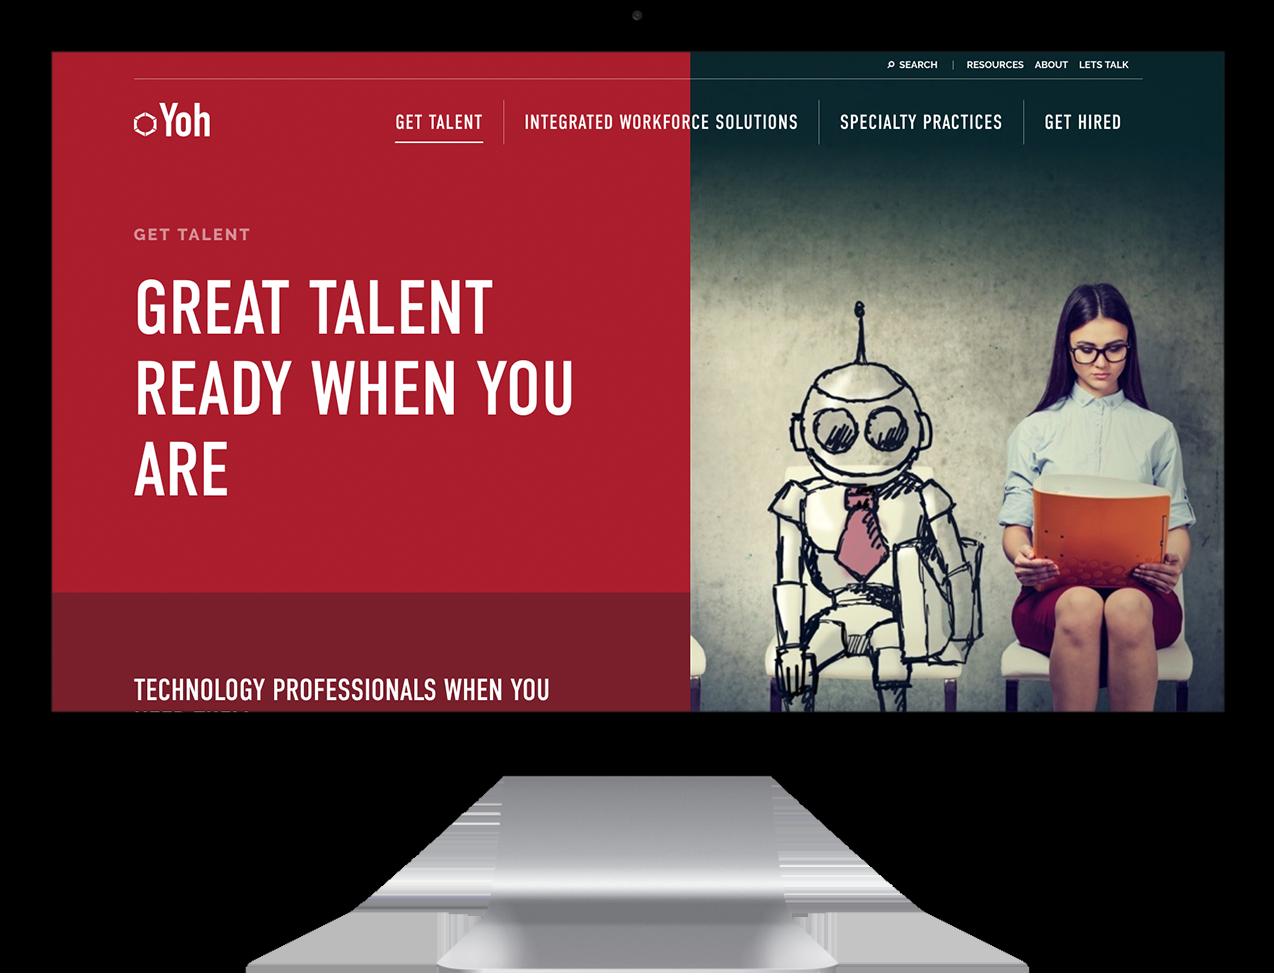 Yoh Custom website design example on desktop monitor